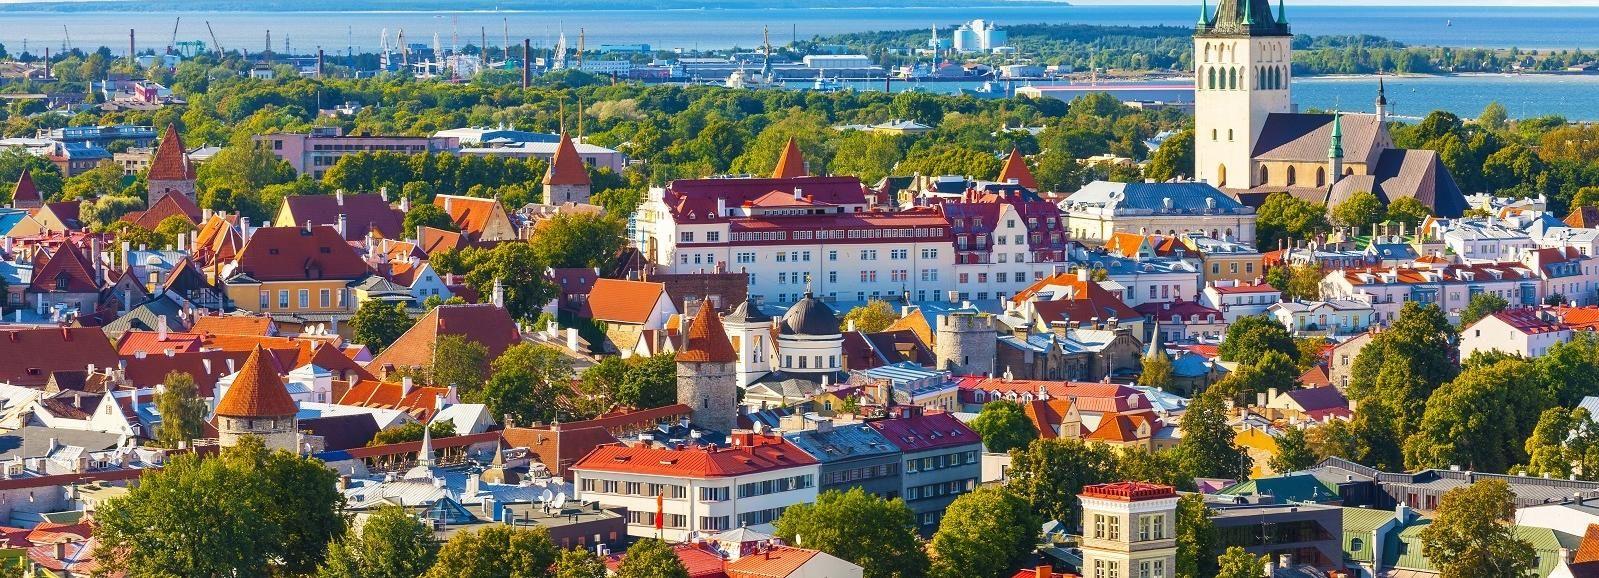 Guided Tallinn Full-Day Tour from Helsinki by Ferry